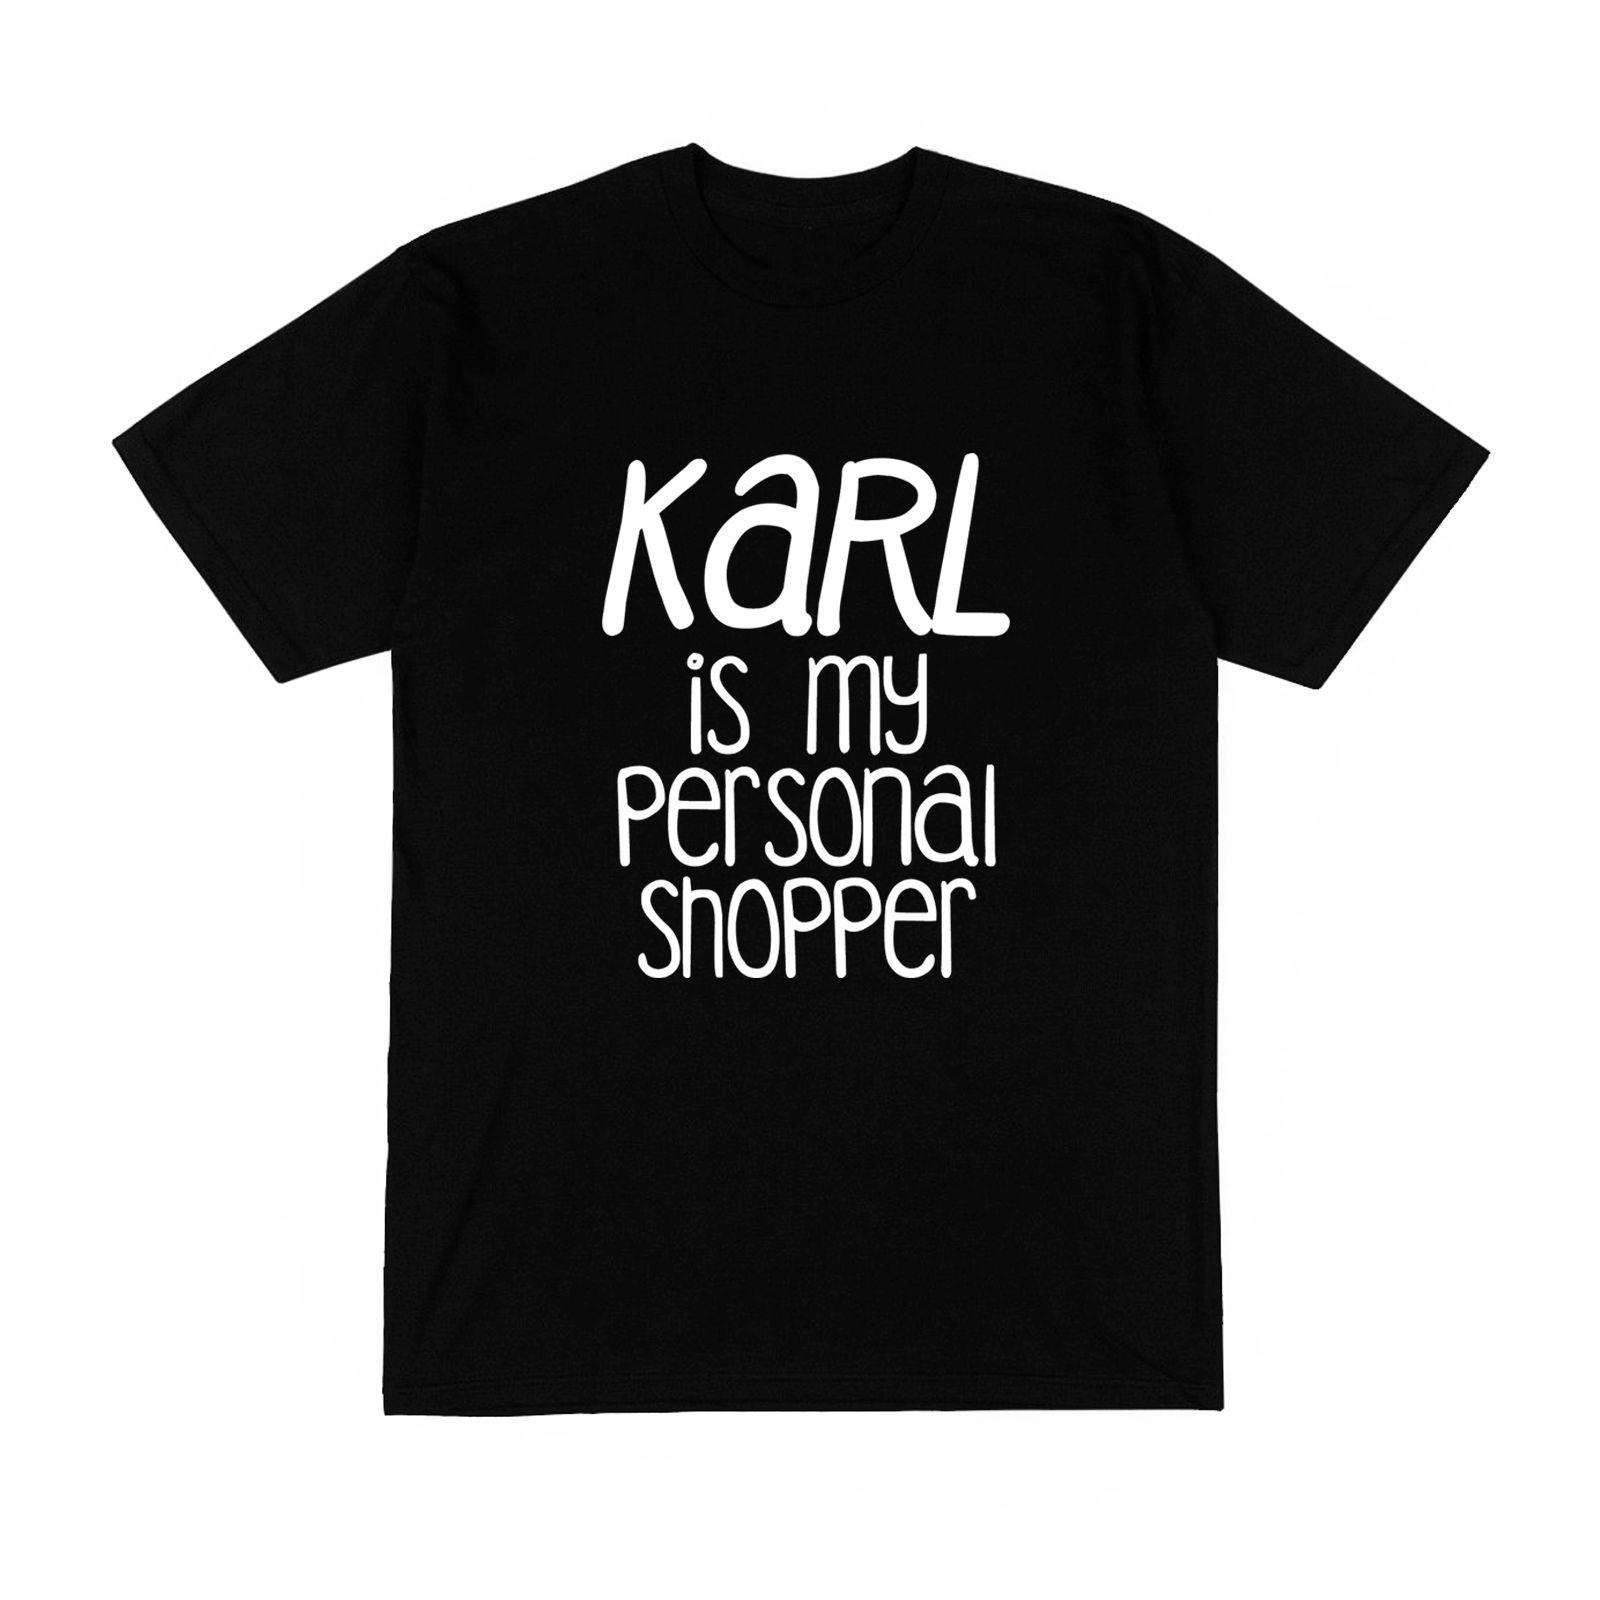 Womens T-shirt Homme monsieur karl est mon acheteur personnel shopping lagerfeld